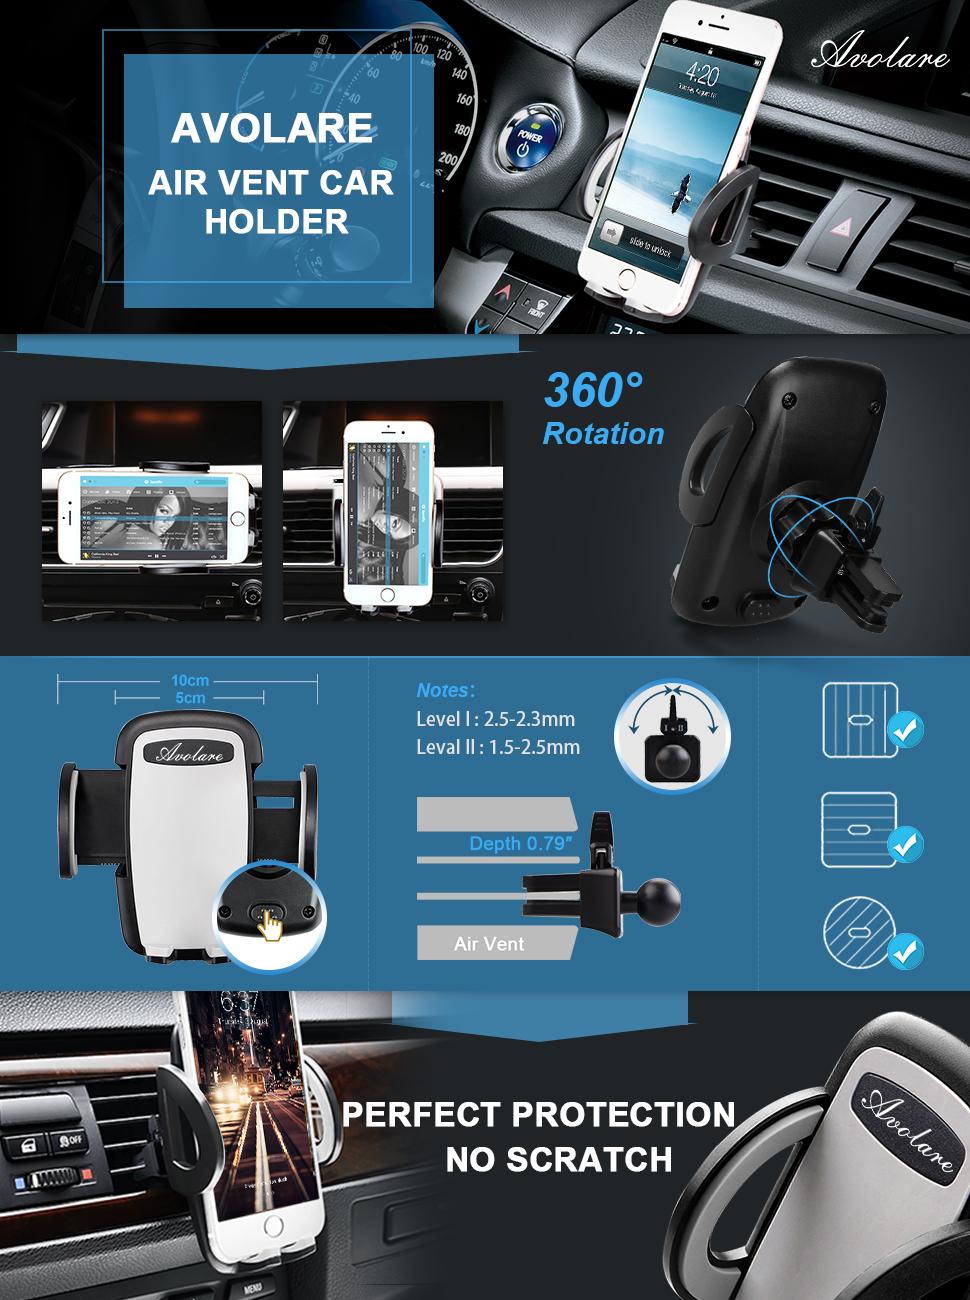 Avolare Phone Holder Car Air Vent Cradle Adjustable Mount Ventilation T360